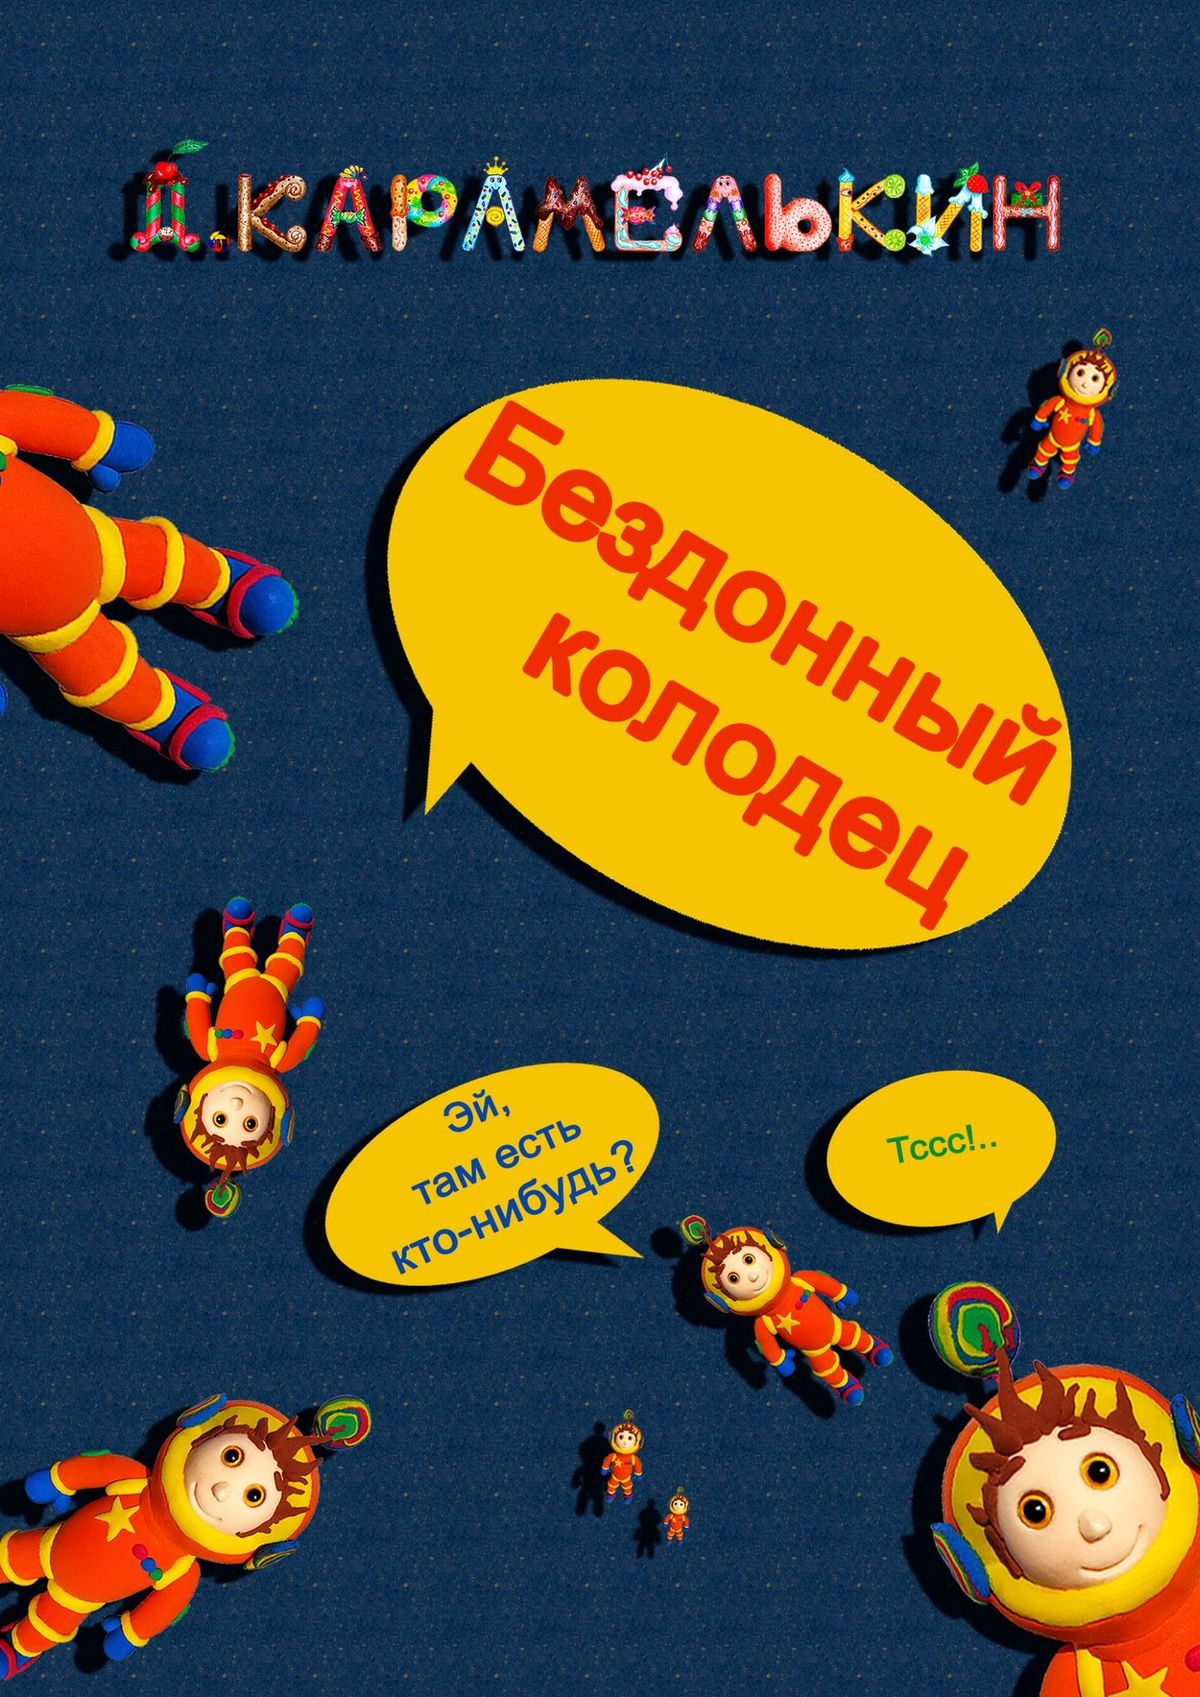 Дмитрий Карамелькин Бездонный колодец